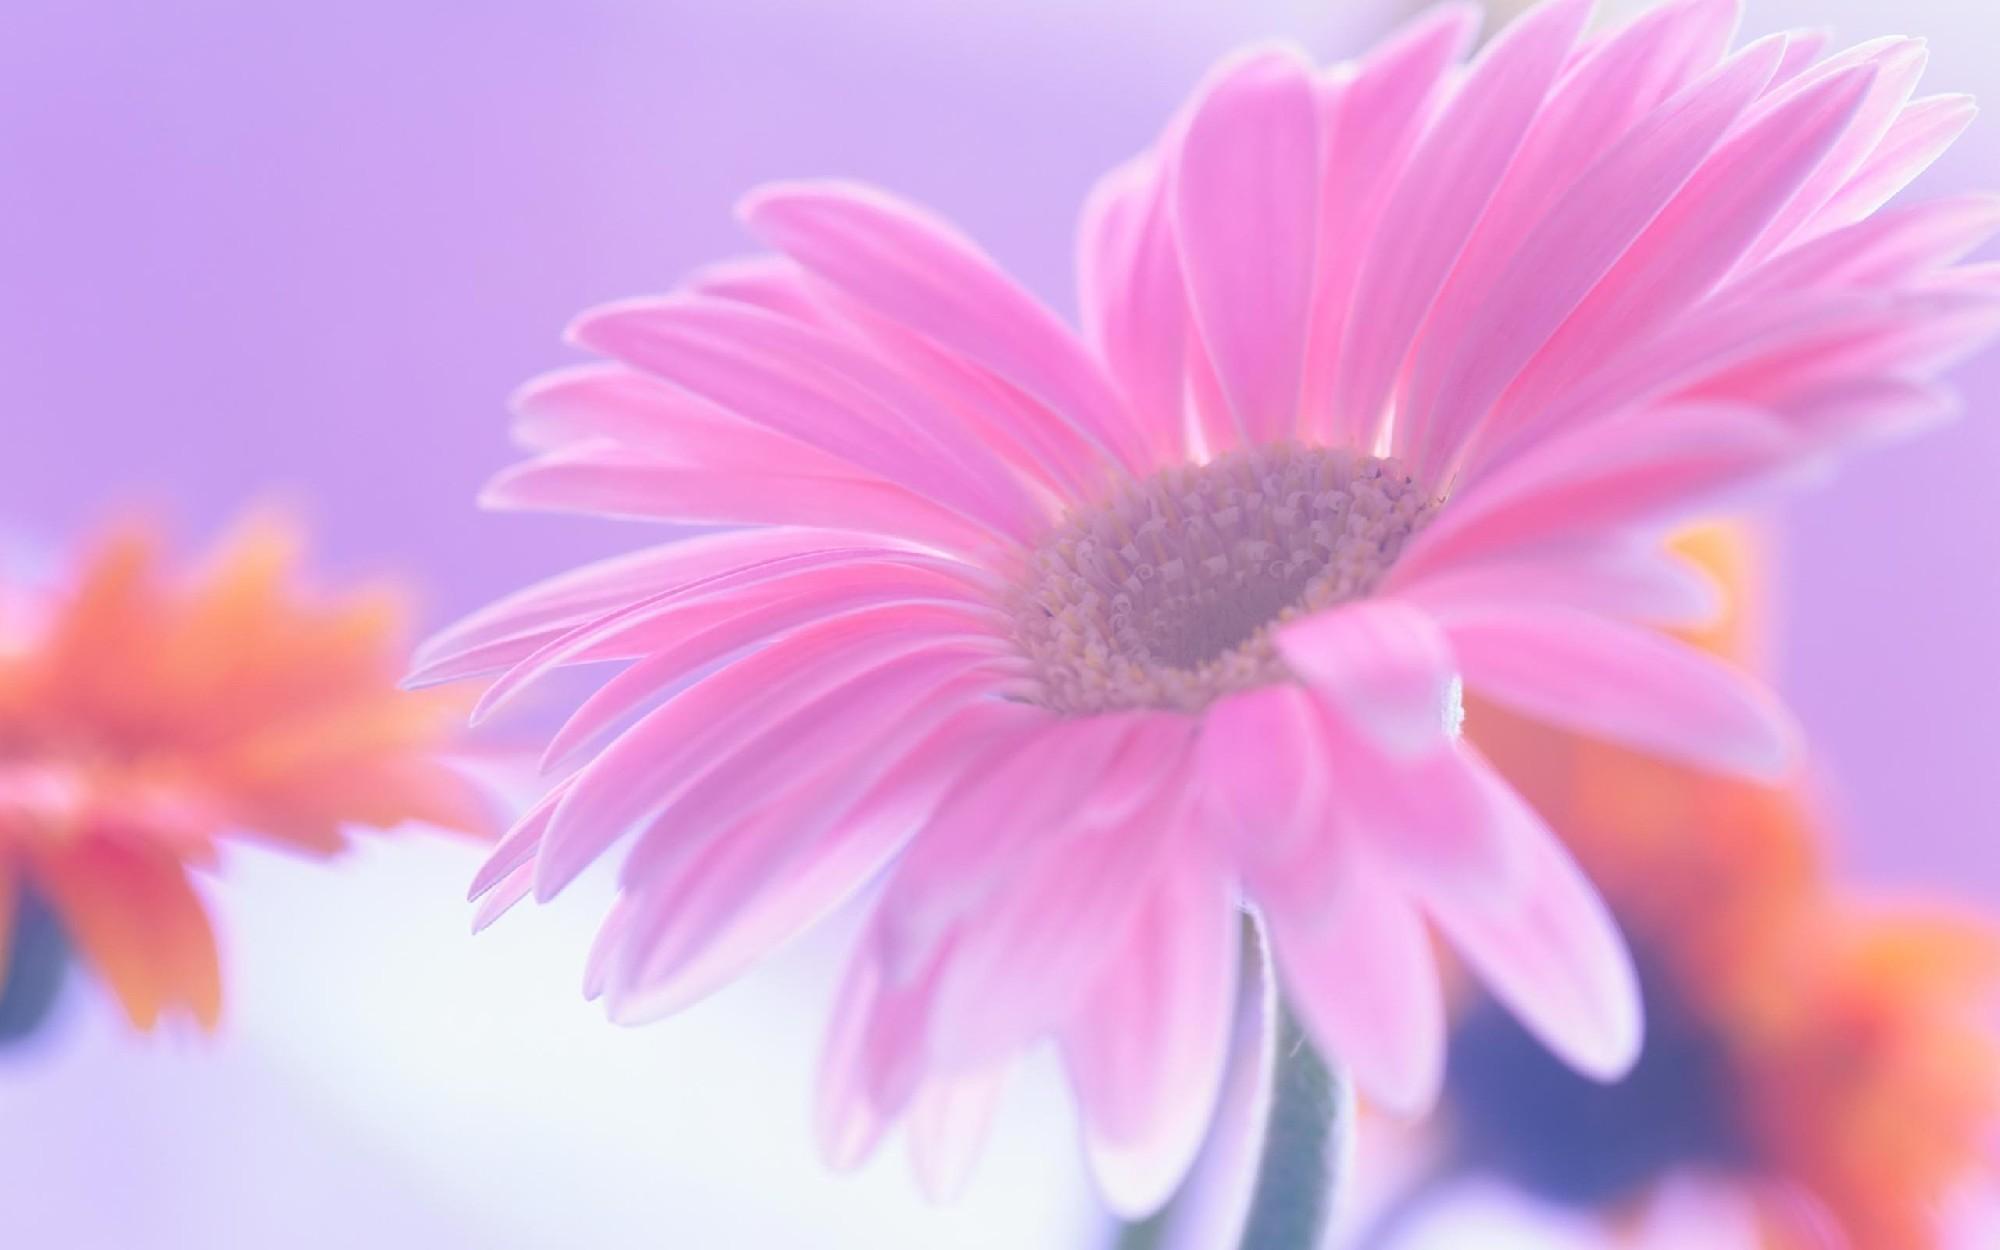 Cherry Blossom Wallpaper Hd Daisy Wallpapers Hd Pixelstalk Net